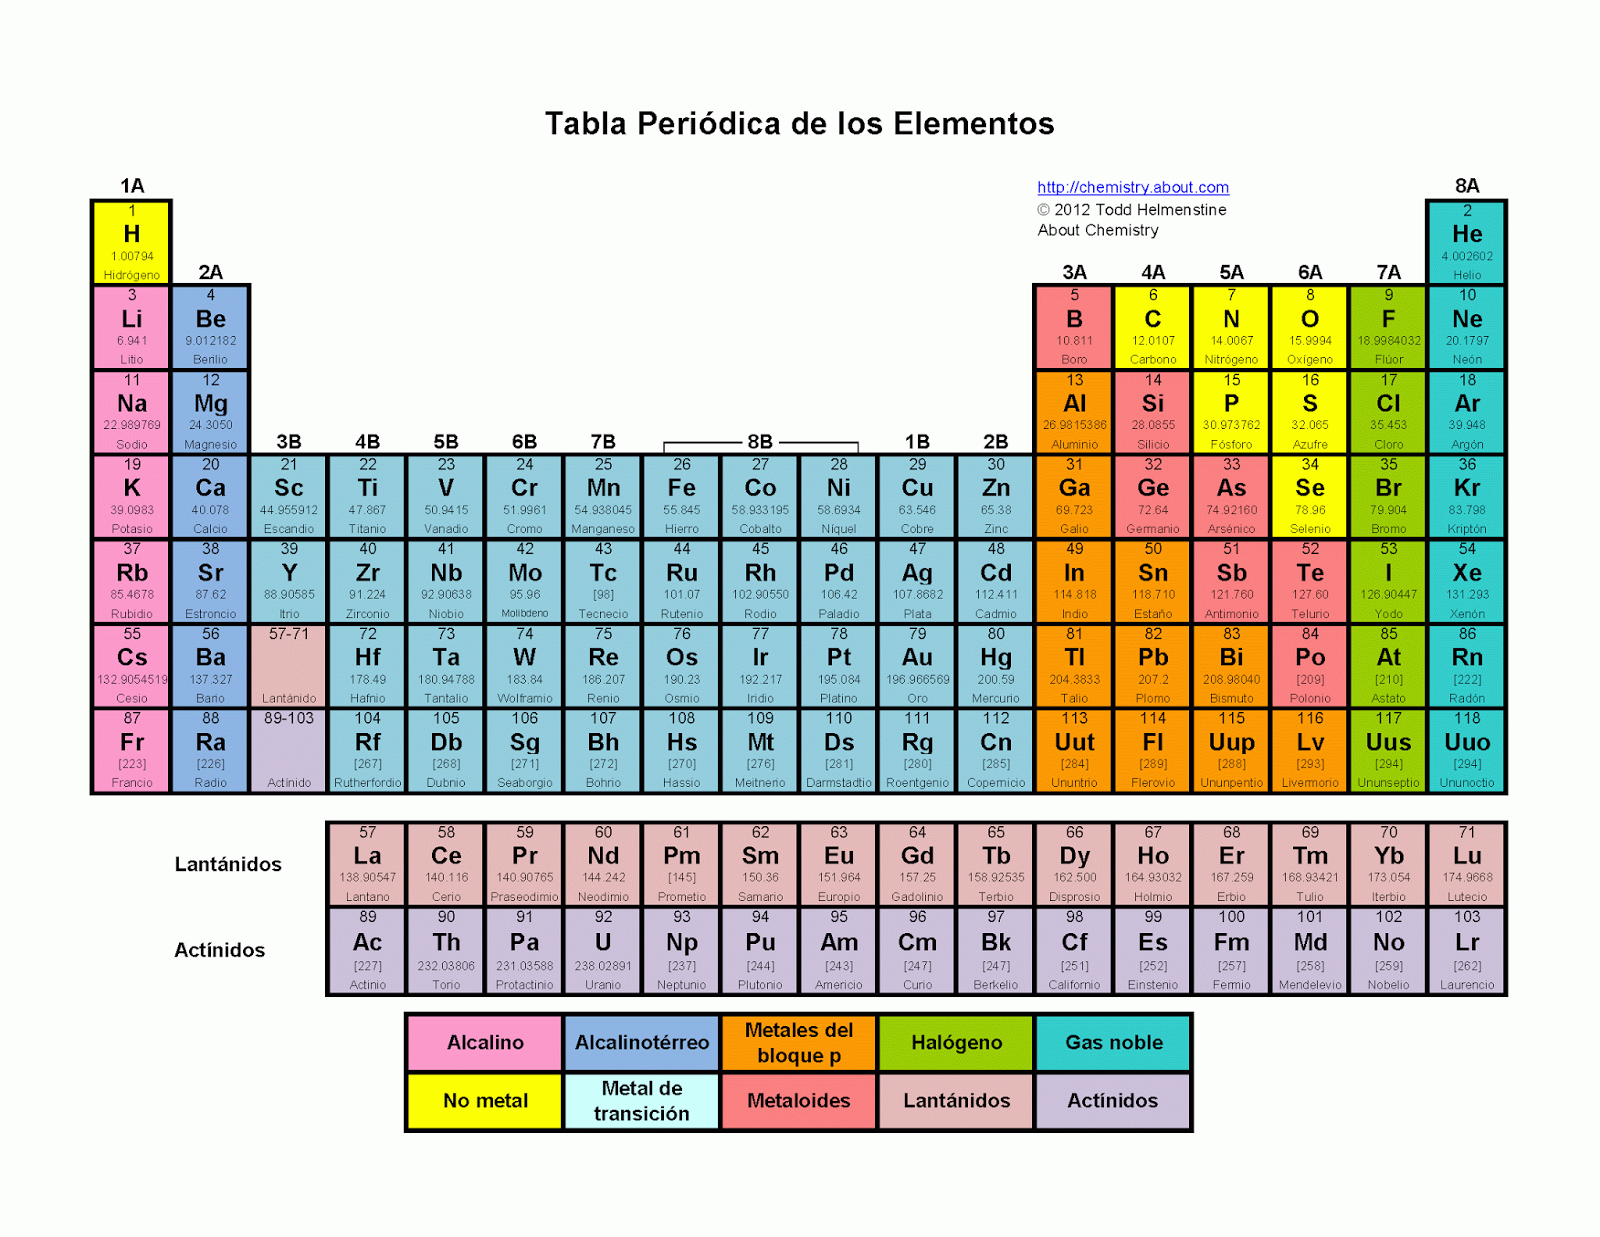 Nitrogeno selenio tabla periodica cmo repasar la tabla peridica urtaz Image collections